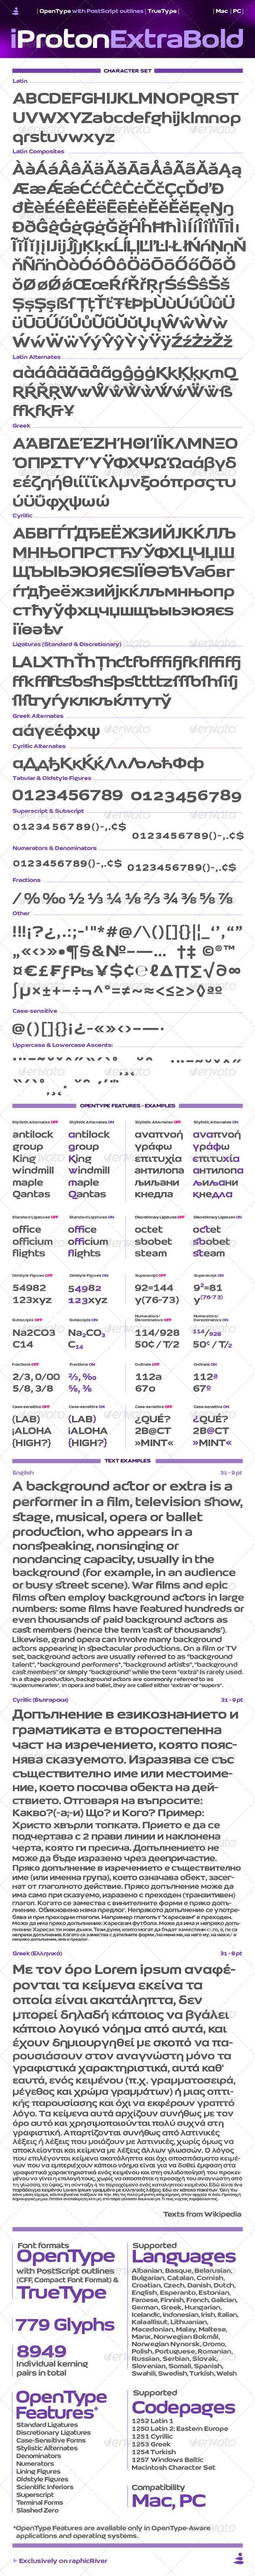 GraphicRiver iProton ExtraBold Font 7646931